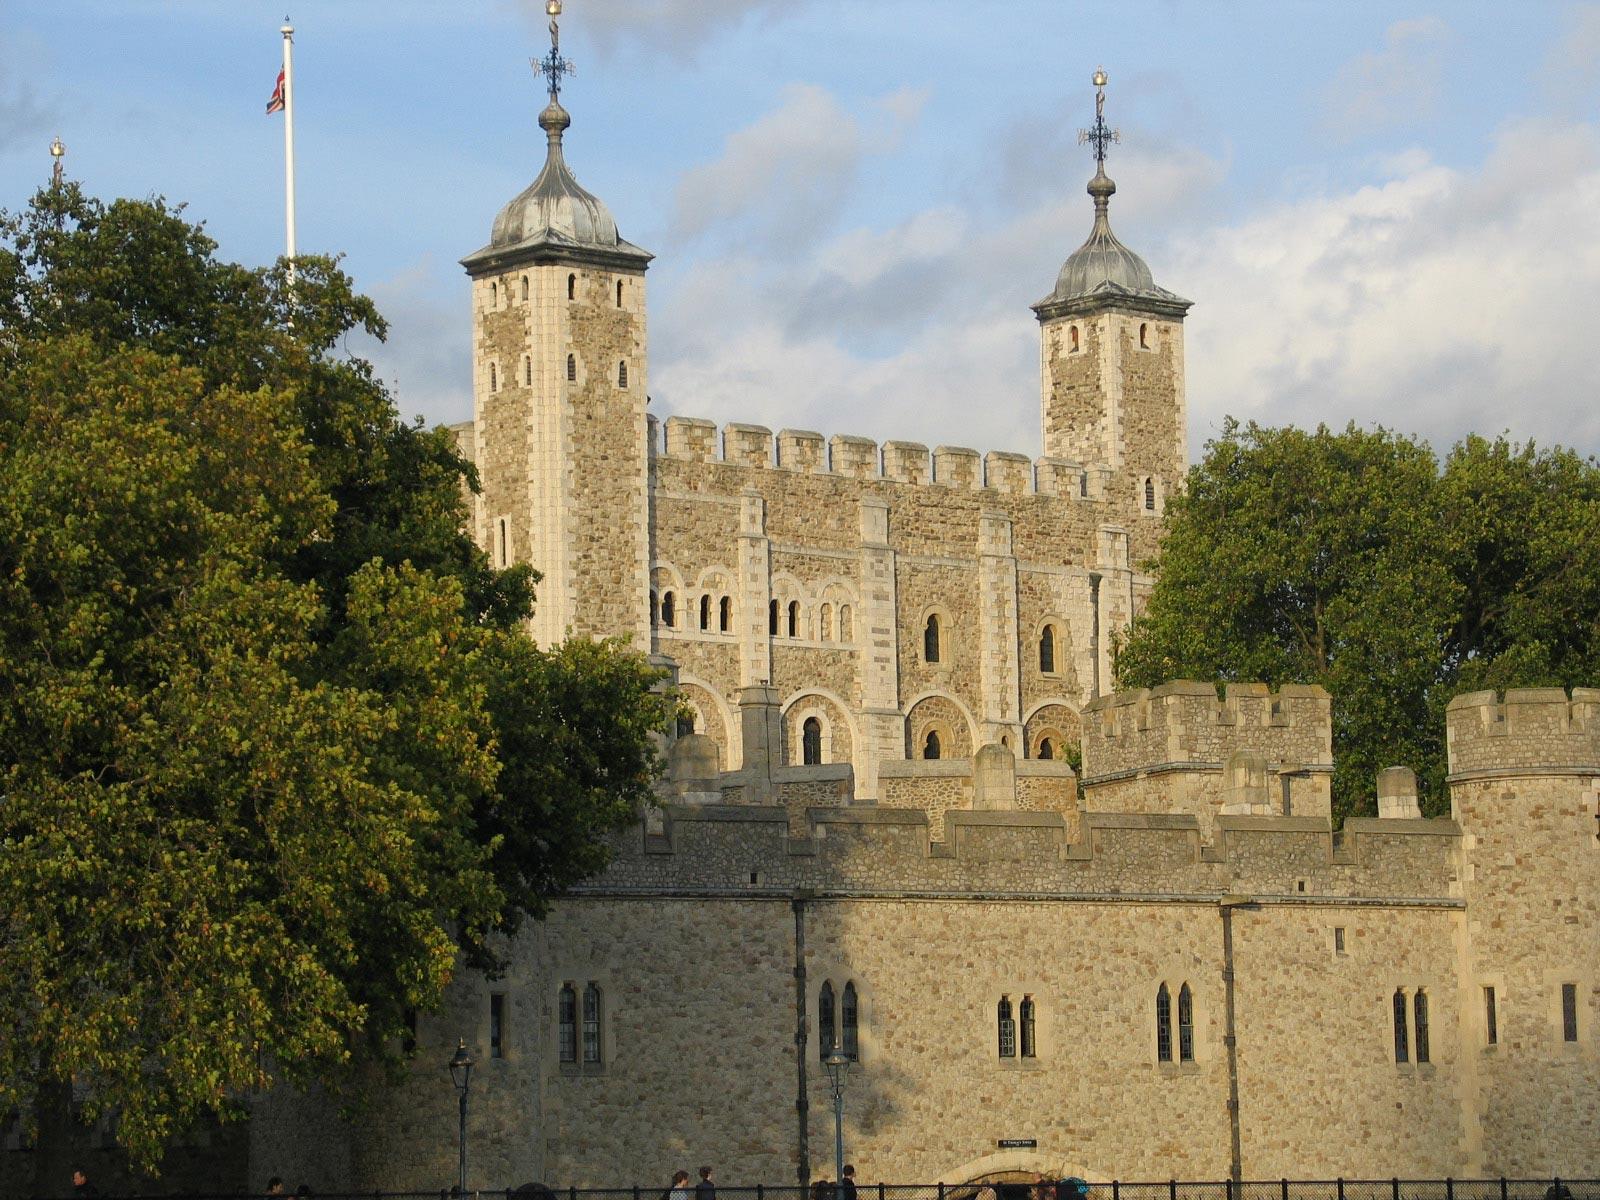 Tower of London. London. England